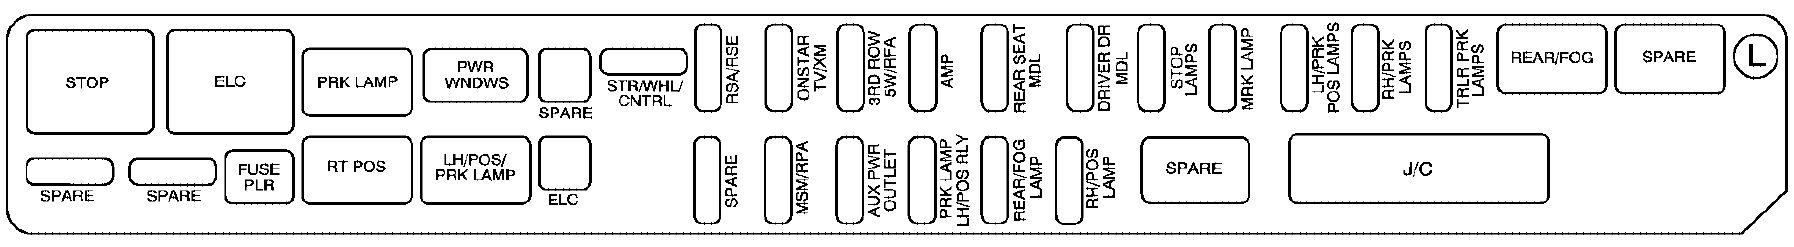 Cadillac Srx  2009  - Fuse Box Diagram